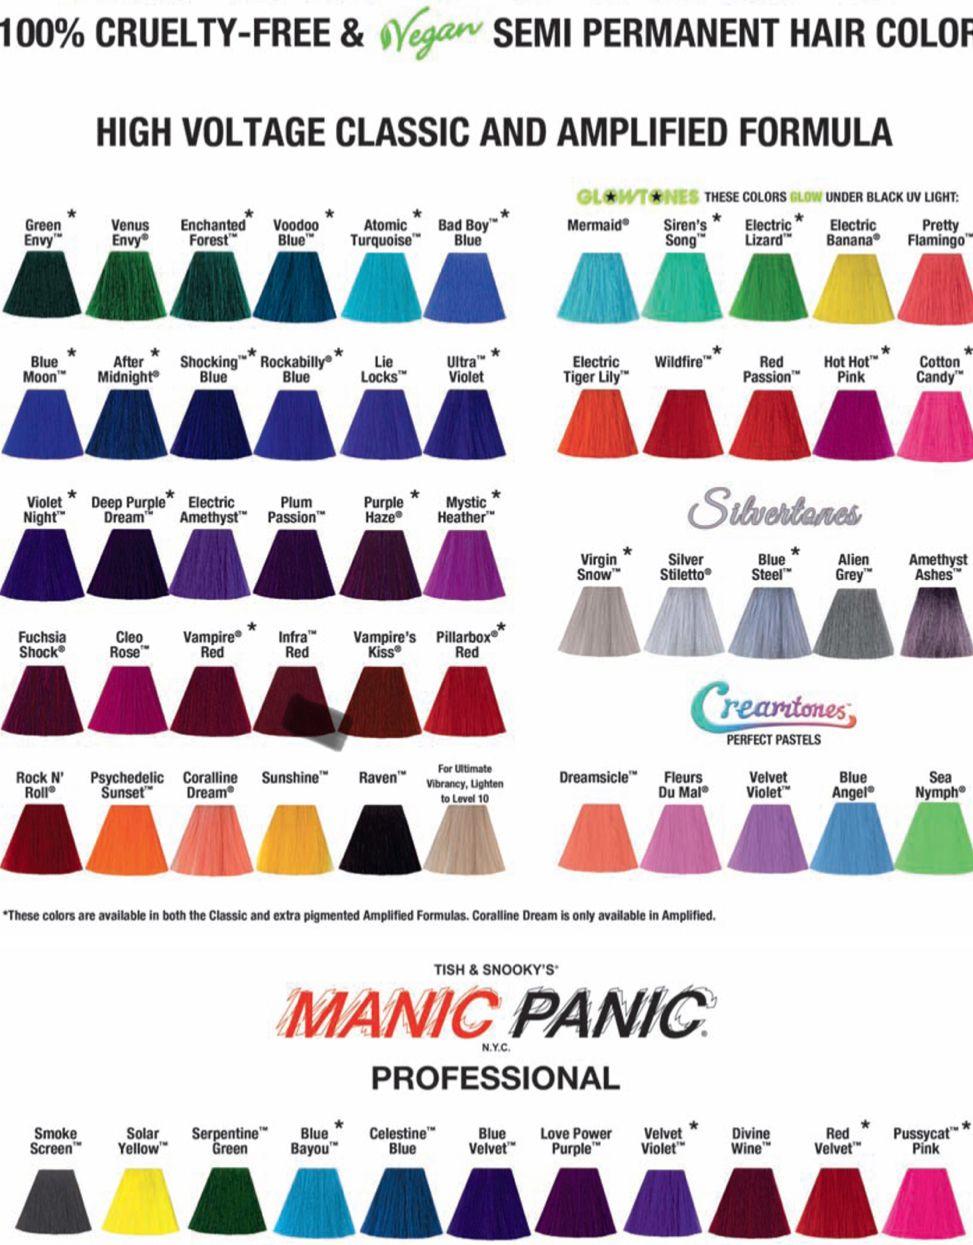 Manic Panic colors   Manic panic hair color, Manic panic colors ...